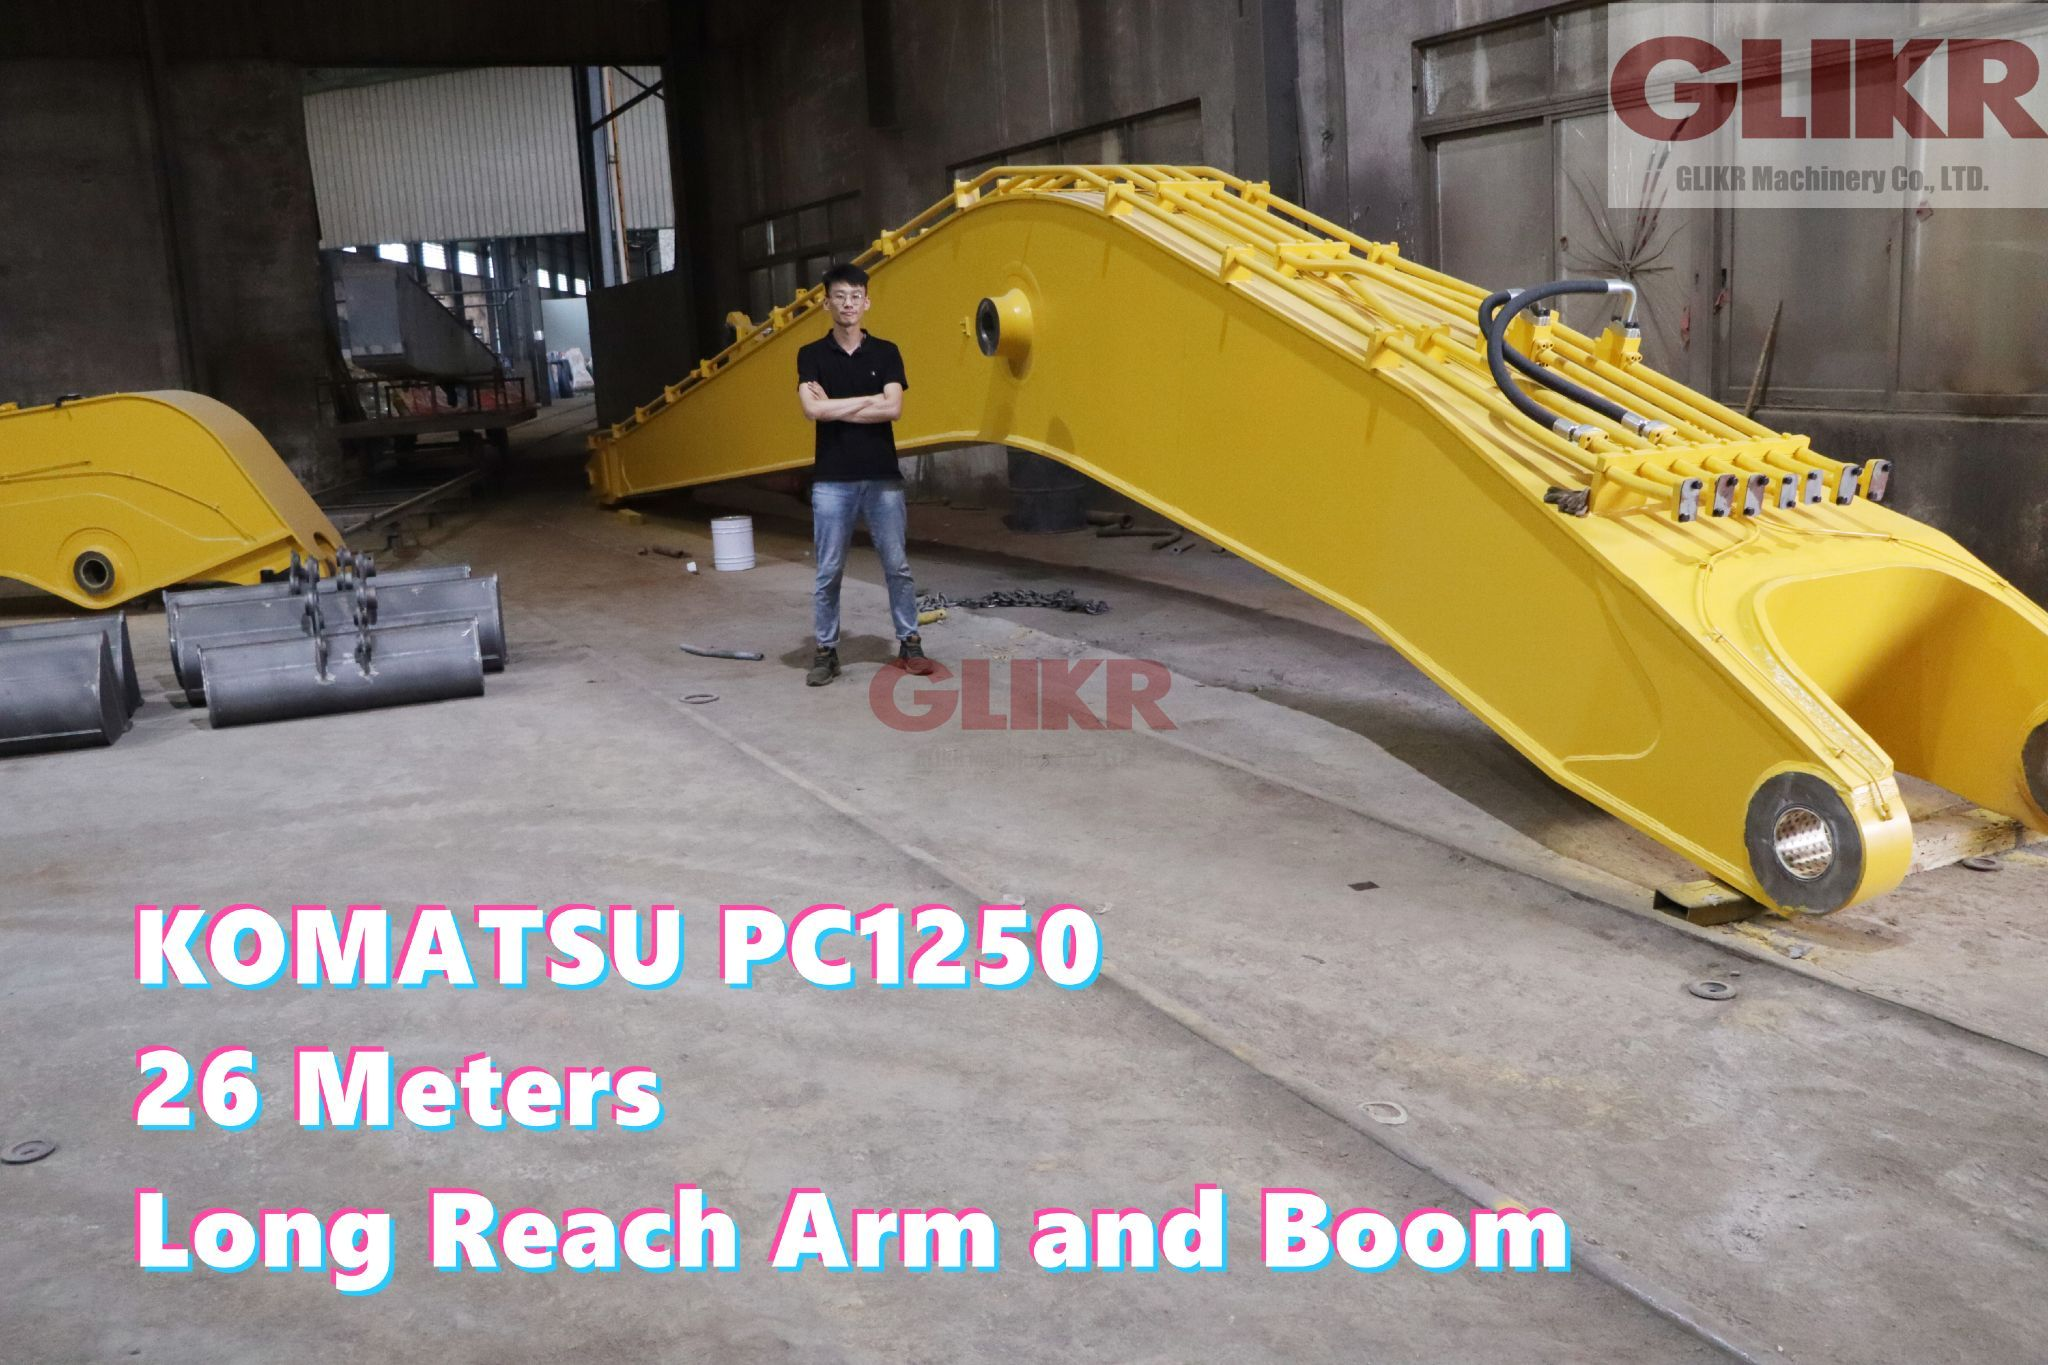 Komatsu PC1250 26 Meters Long Reach Arm and Boom